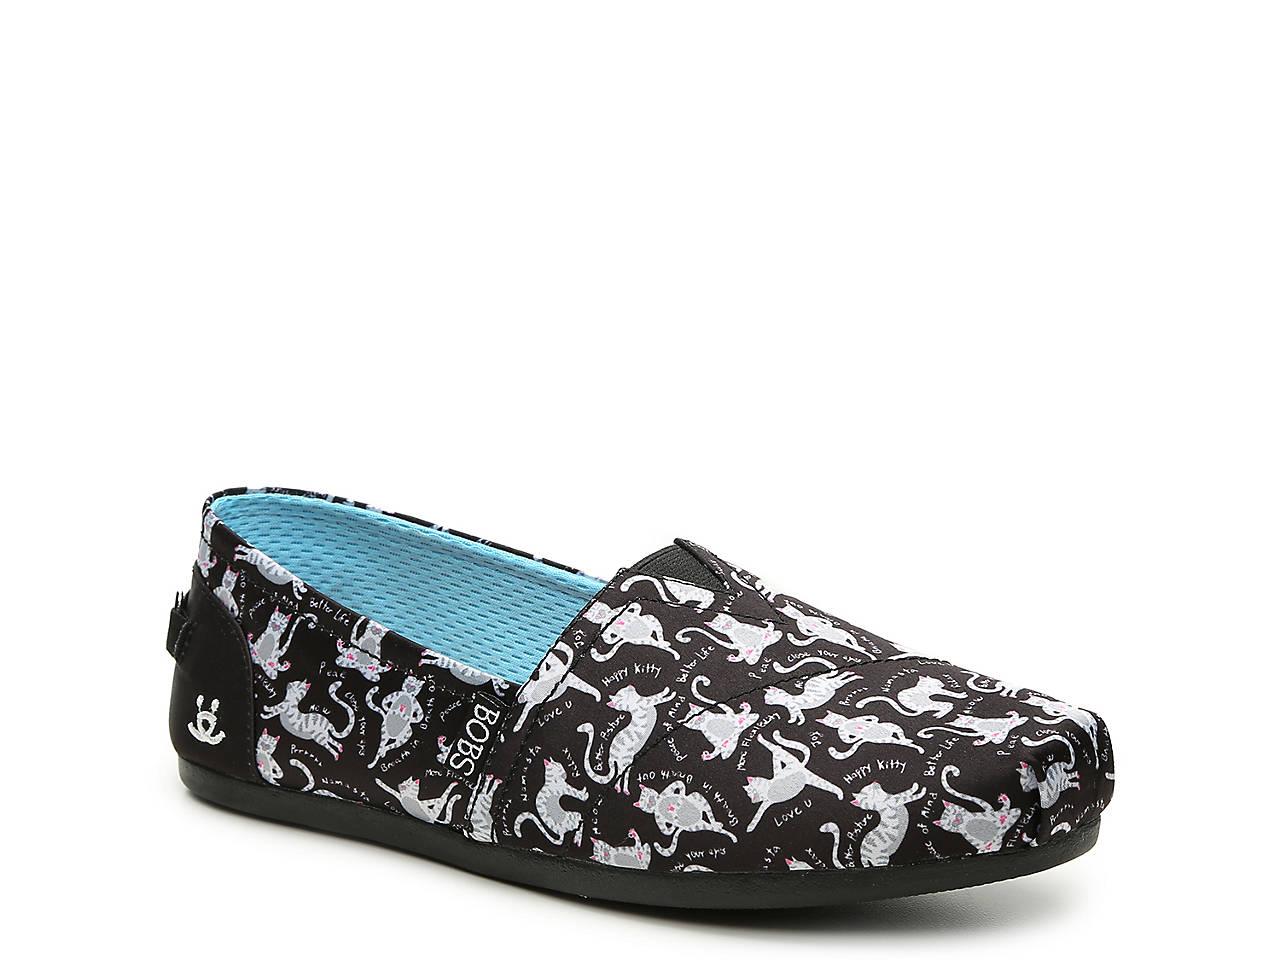 Skechers Bobs Plush Zen Kitty Slip On Women S Shoes Dsw